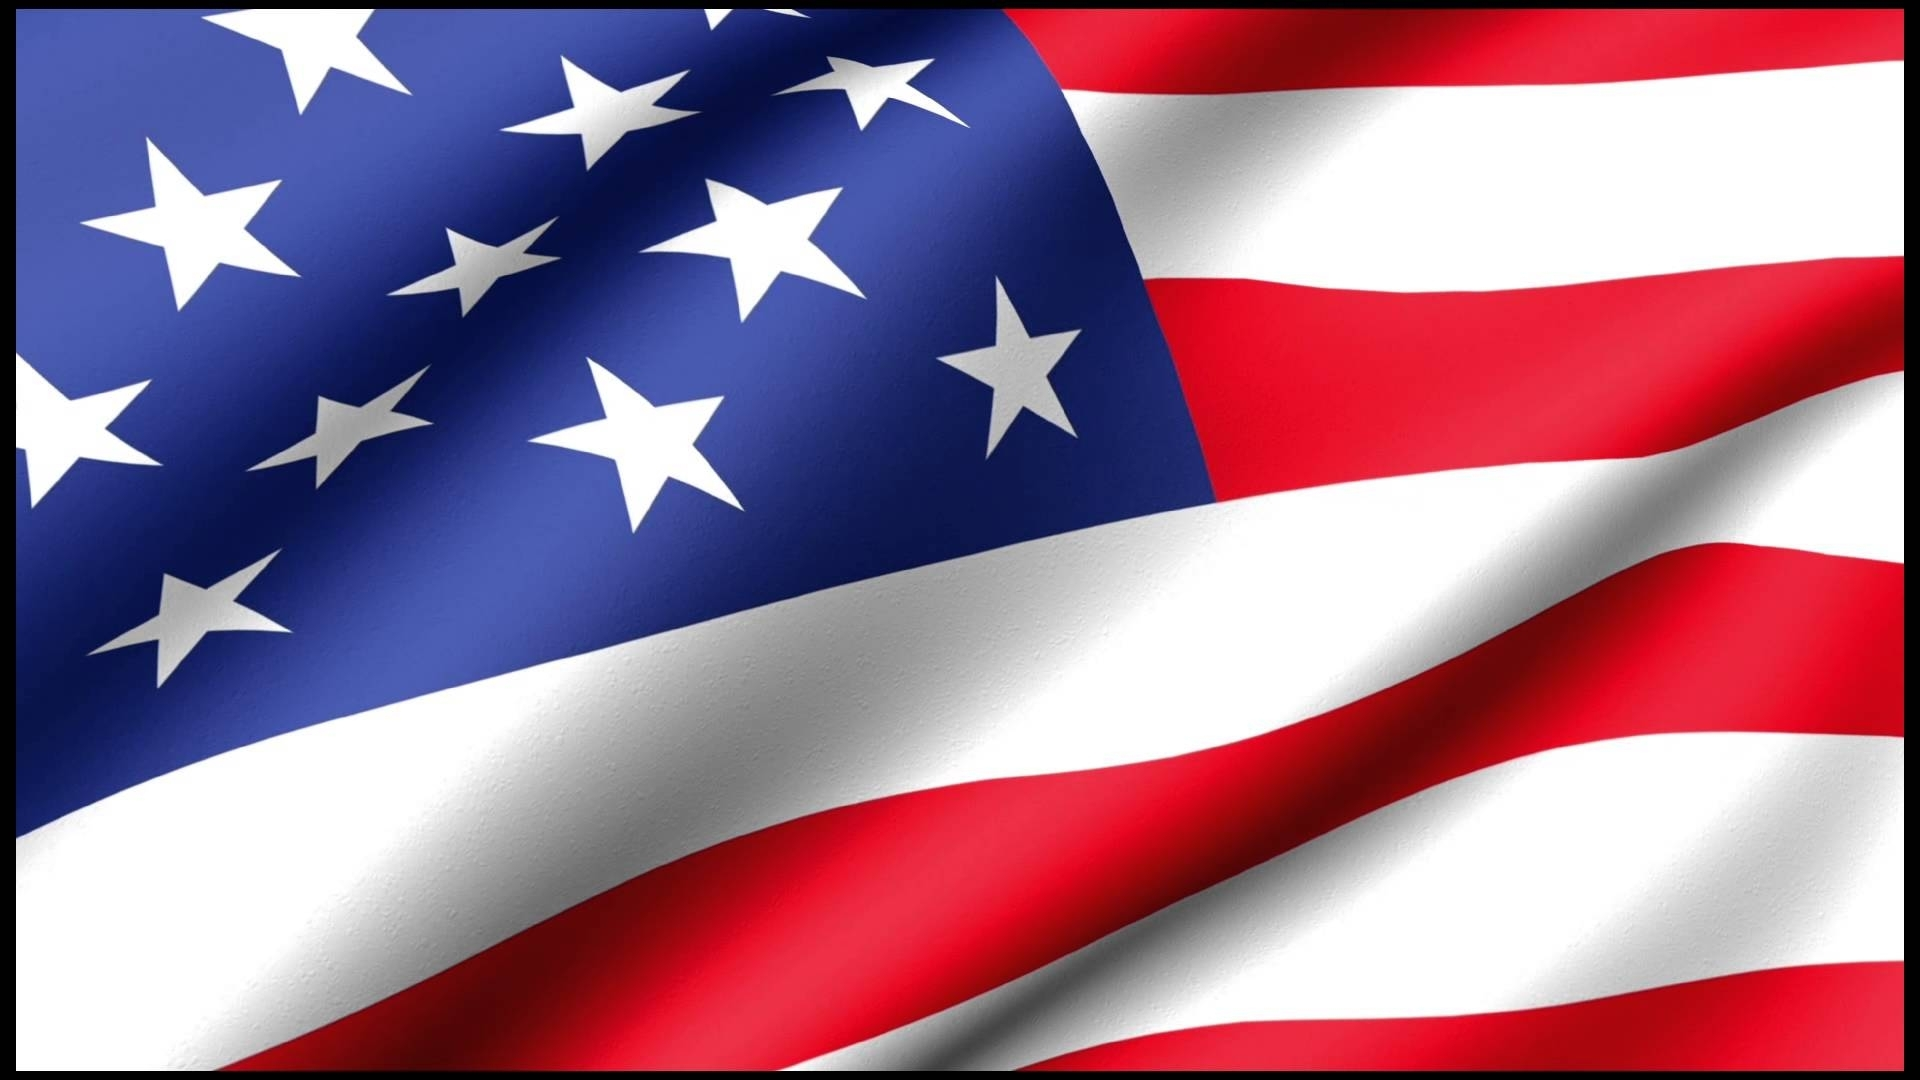 usa american flag waving loop 4k - youtube